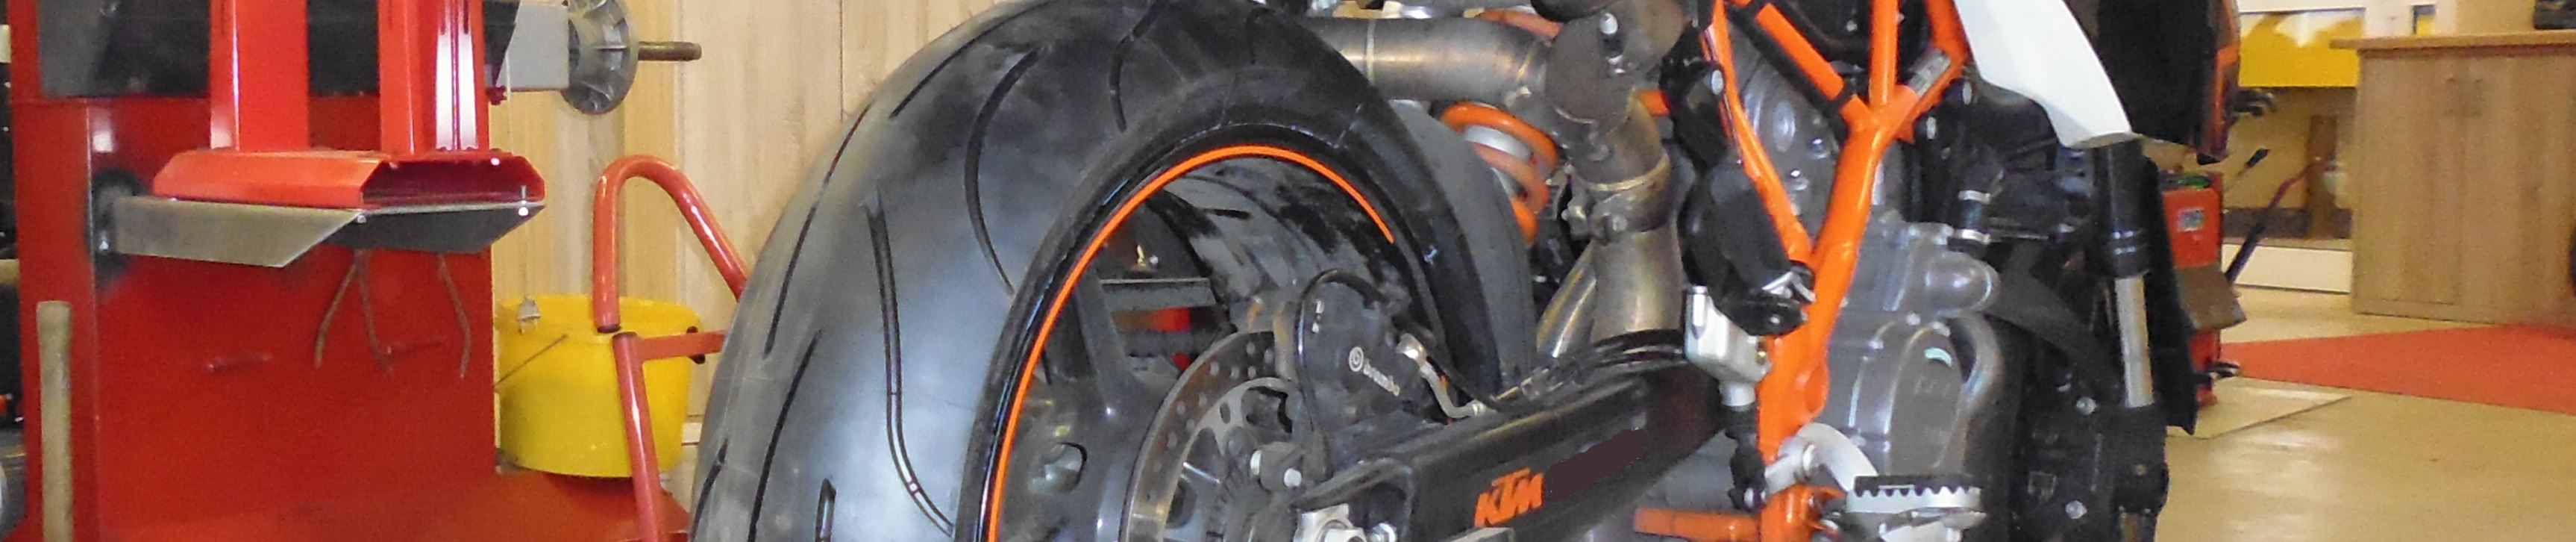 Motorradreifen bei HEBA-Reifen in Mistelbach bei Wels